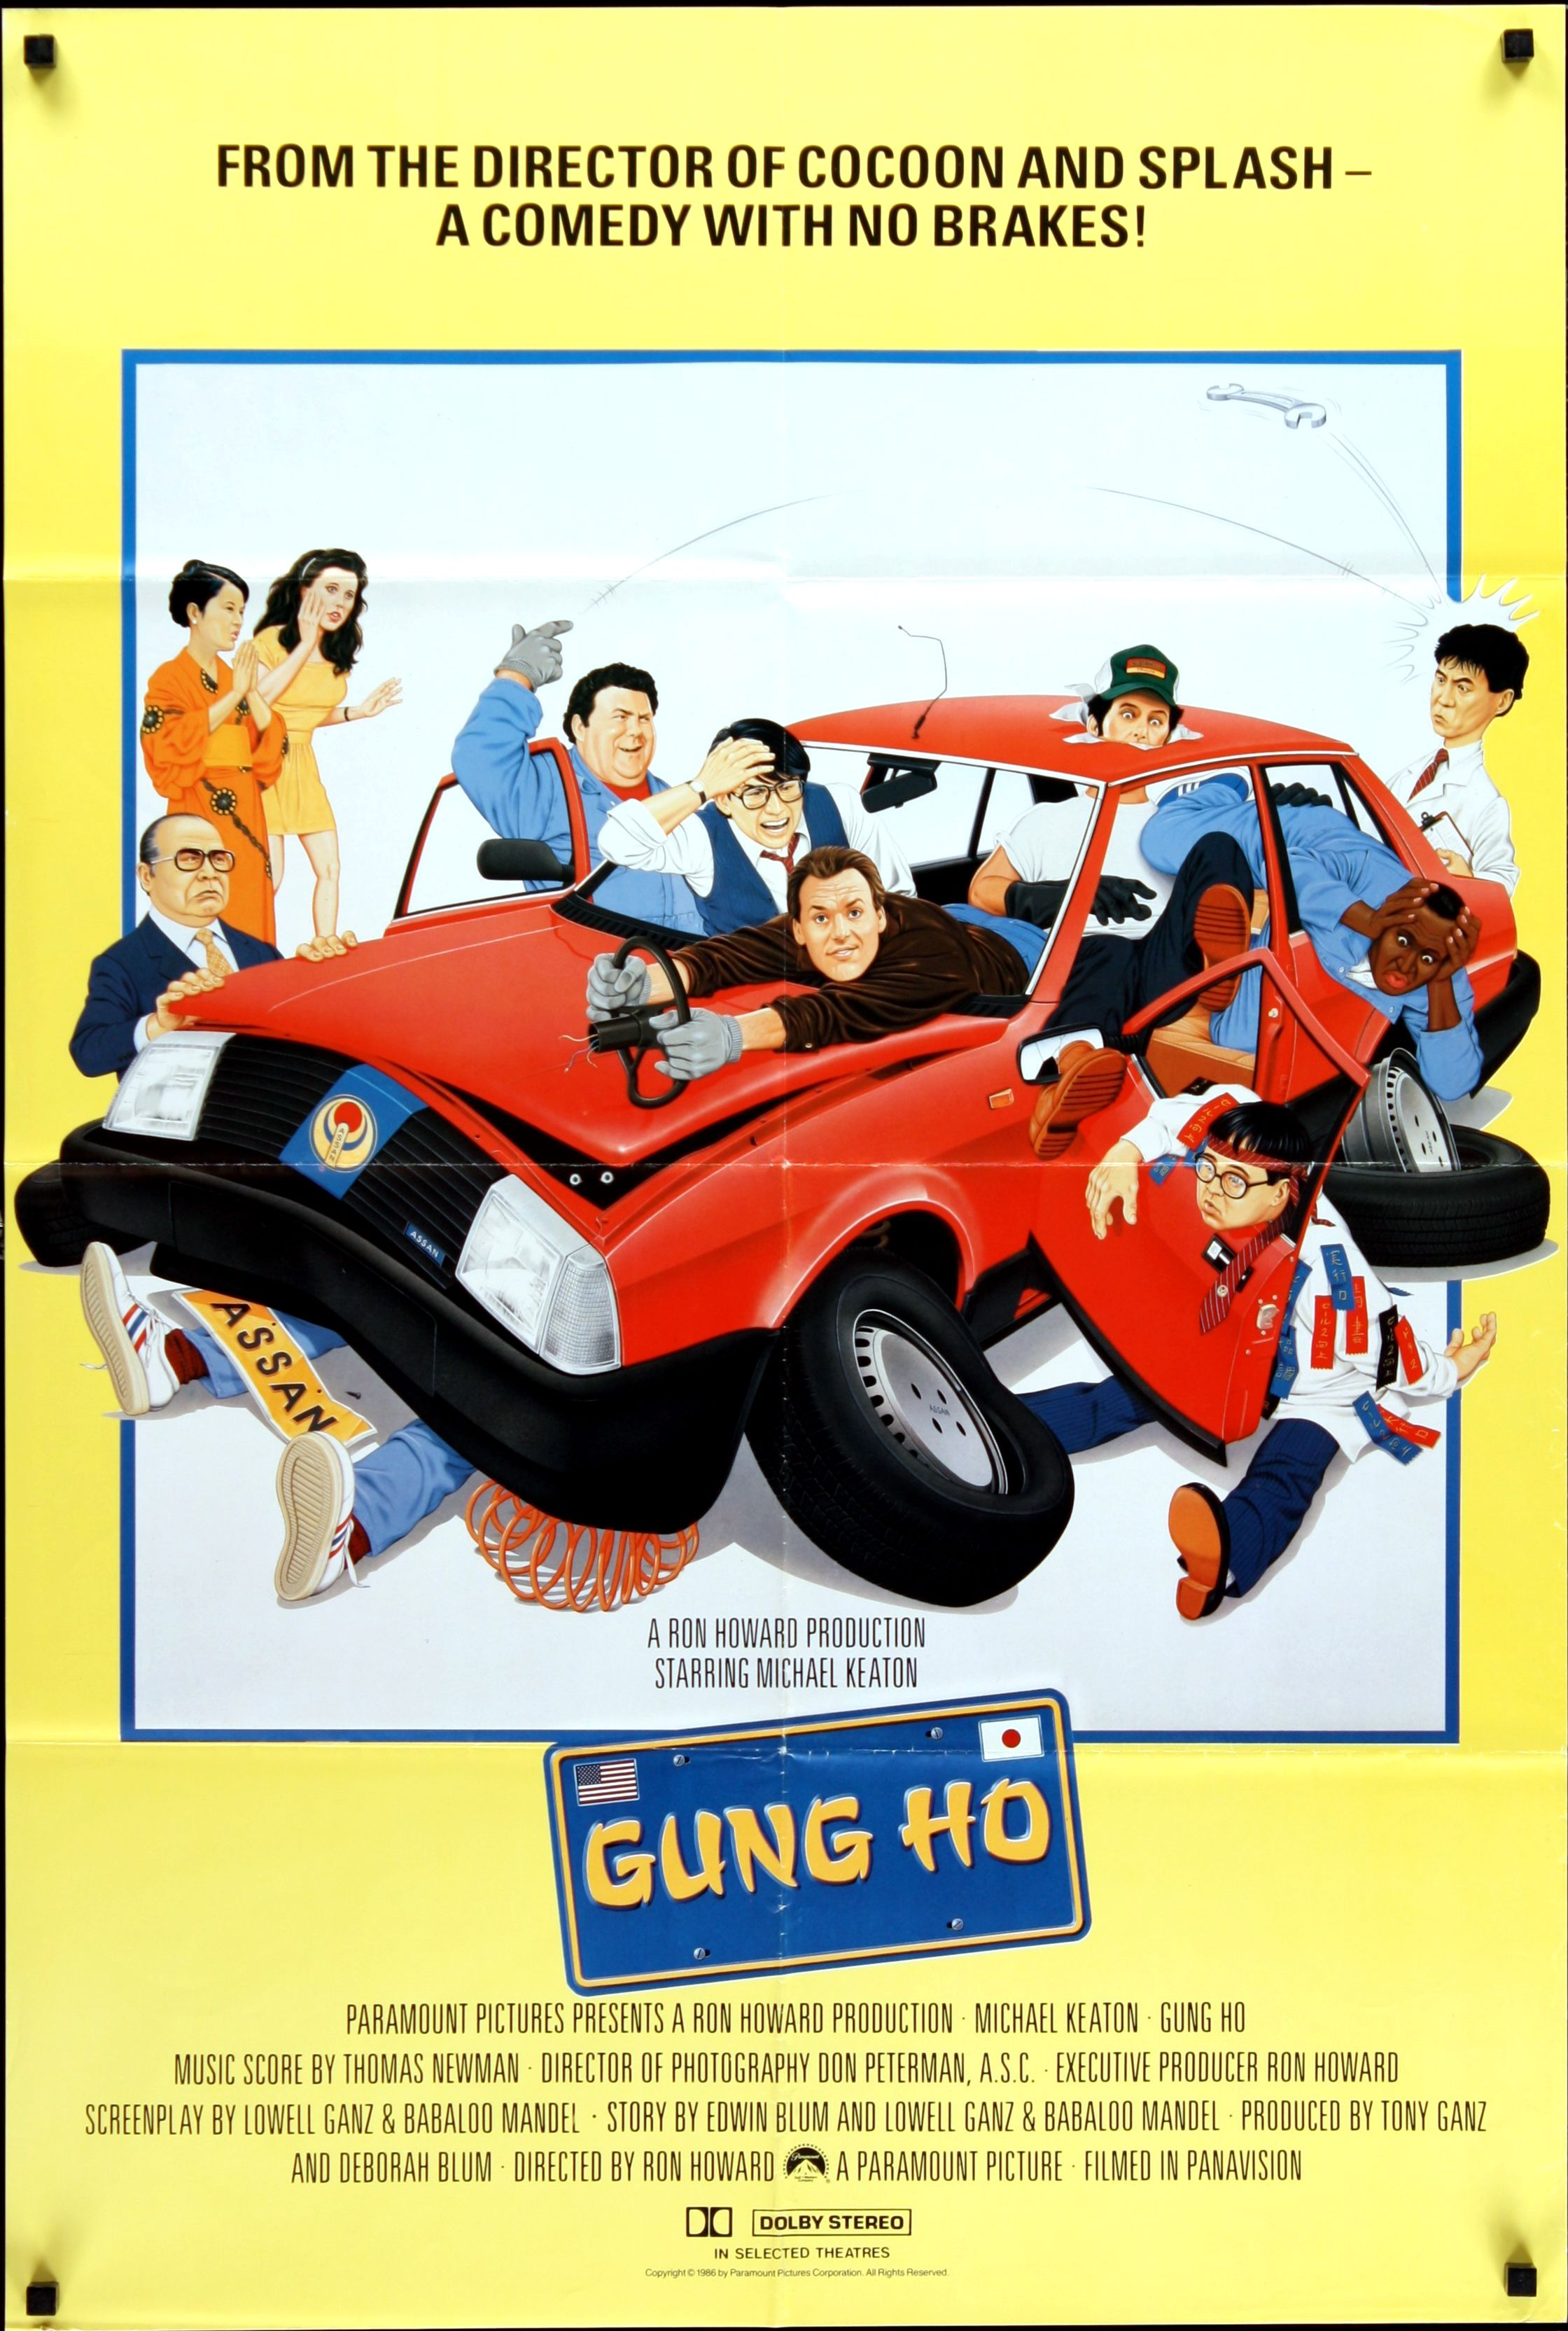 Gung Ho Movie Soundtrack